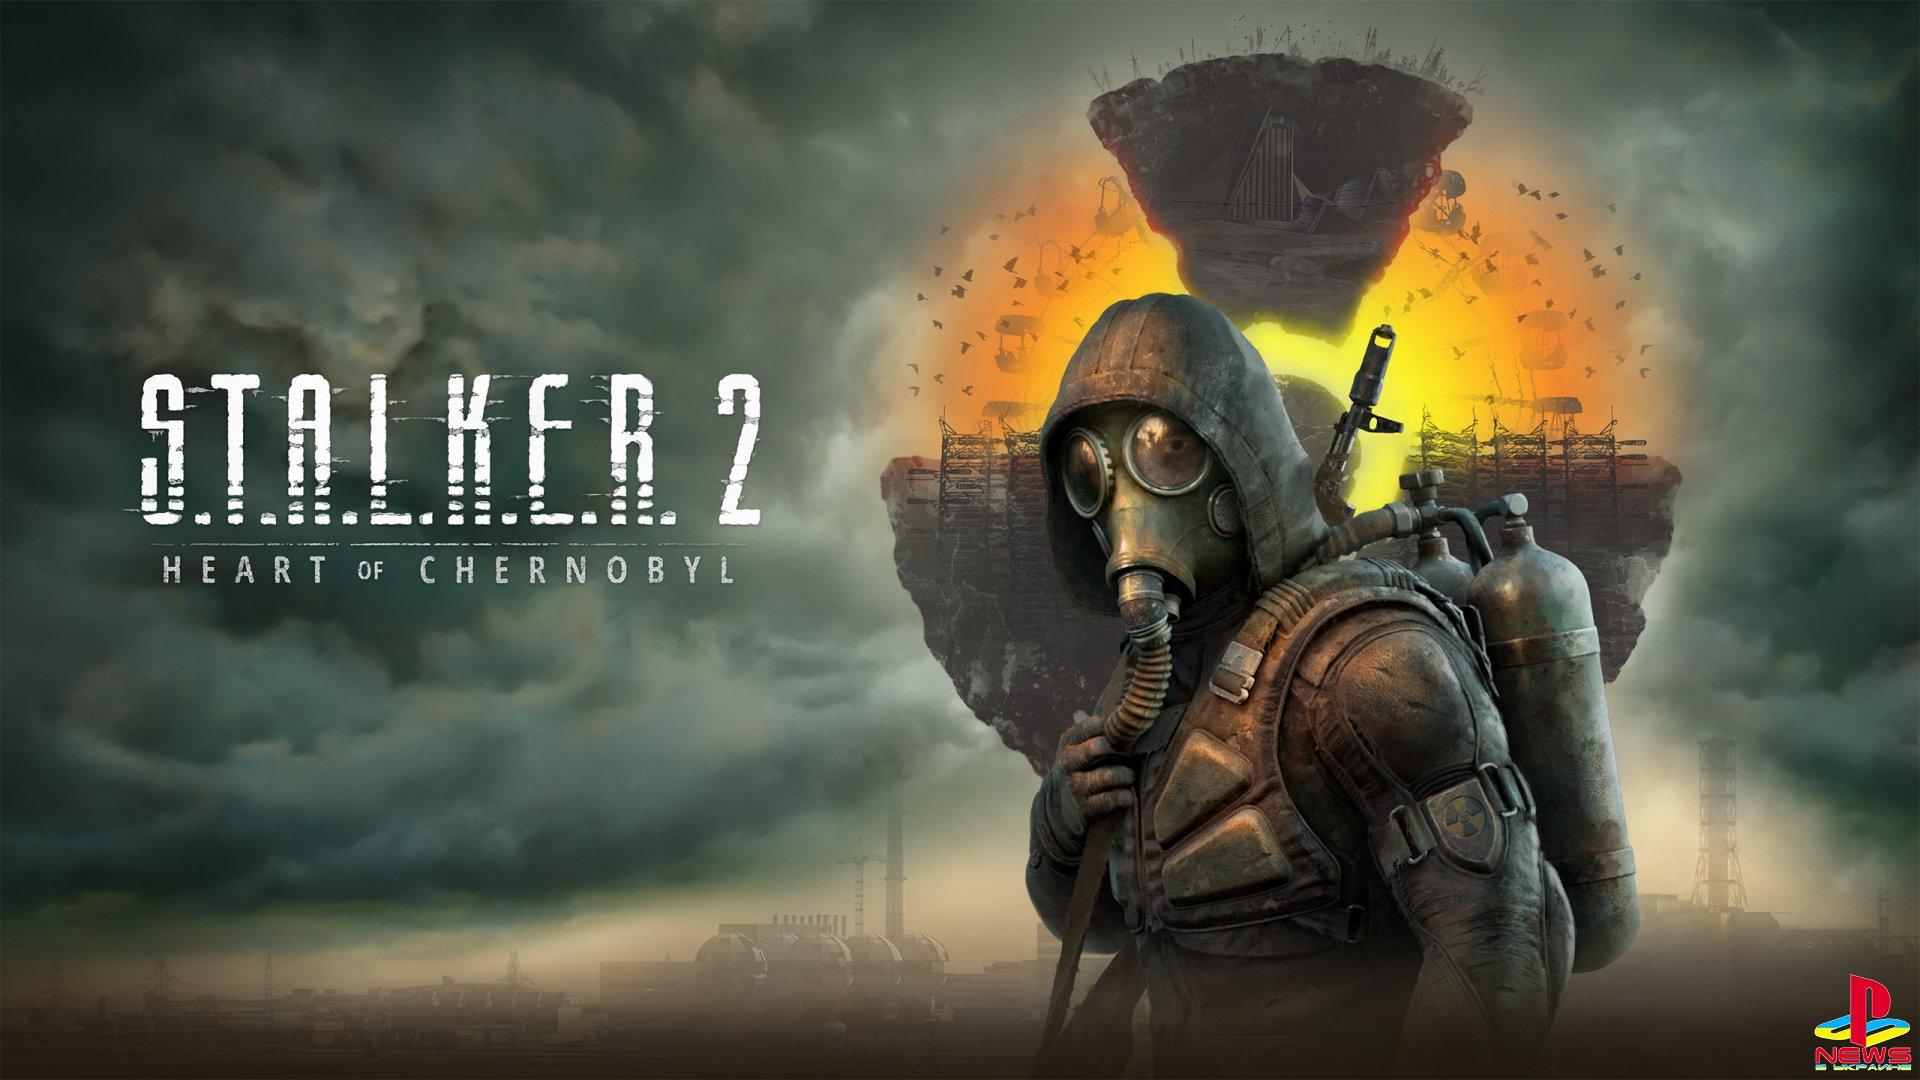 GSC Game World объяснила слабый ИИ врагов в трейлере S.T.A.L.K.E.R. 2: Heart of Chernobyl